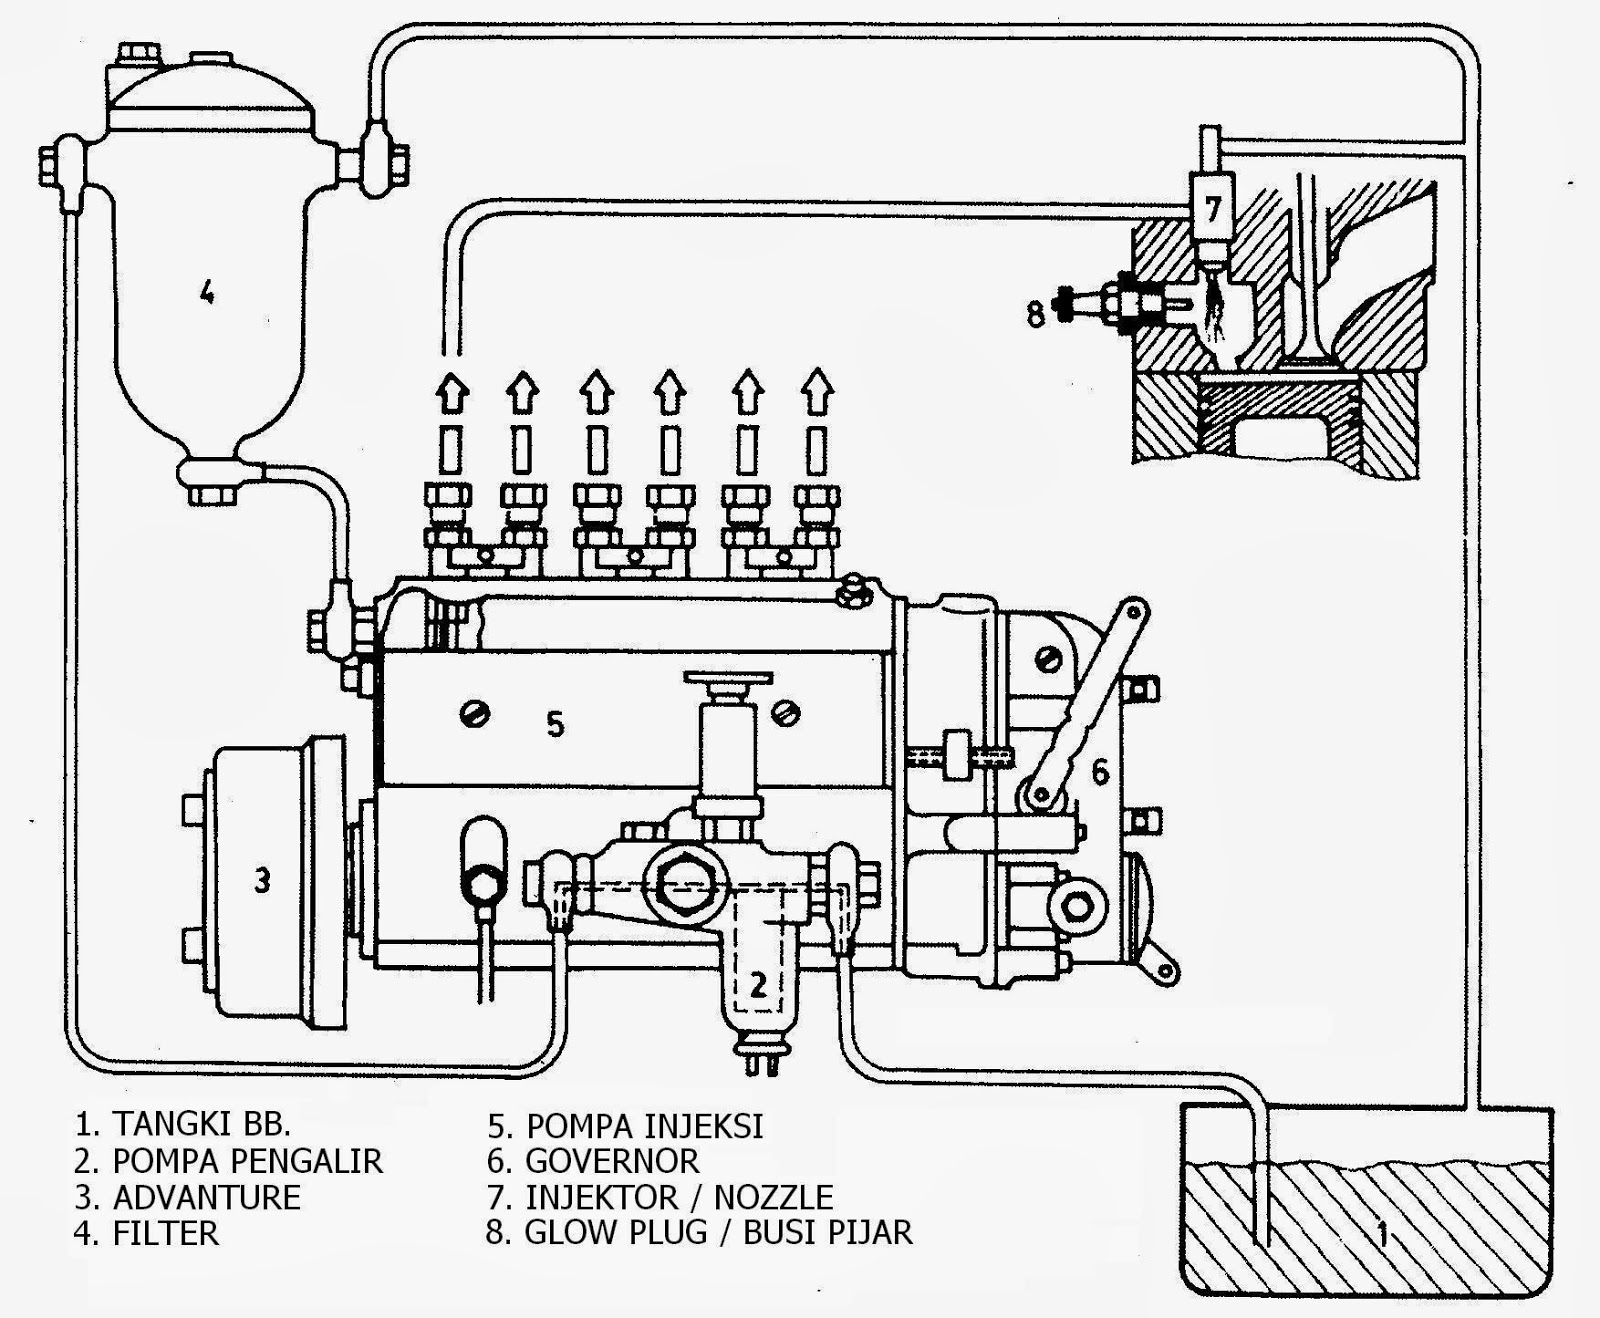 hight resolution of 04 hyundai elantra fuse box diagram hyundai auto wiring 2003 hyundai santa fe audio wiring diagram 2000 hyundai tiburon wiring schematic